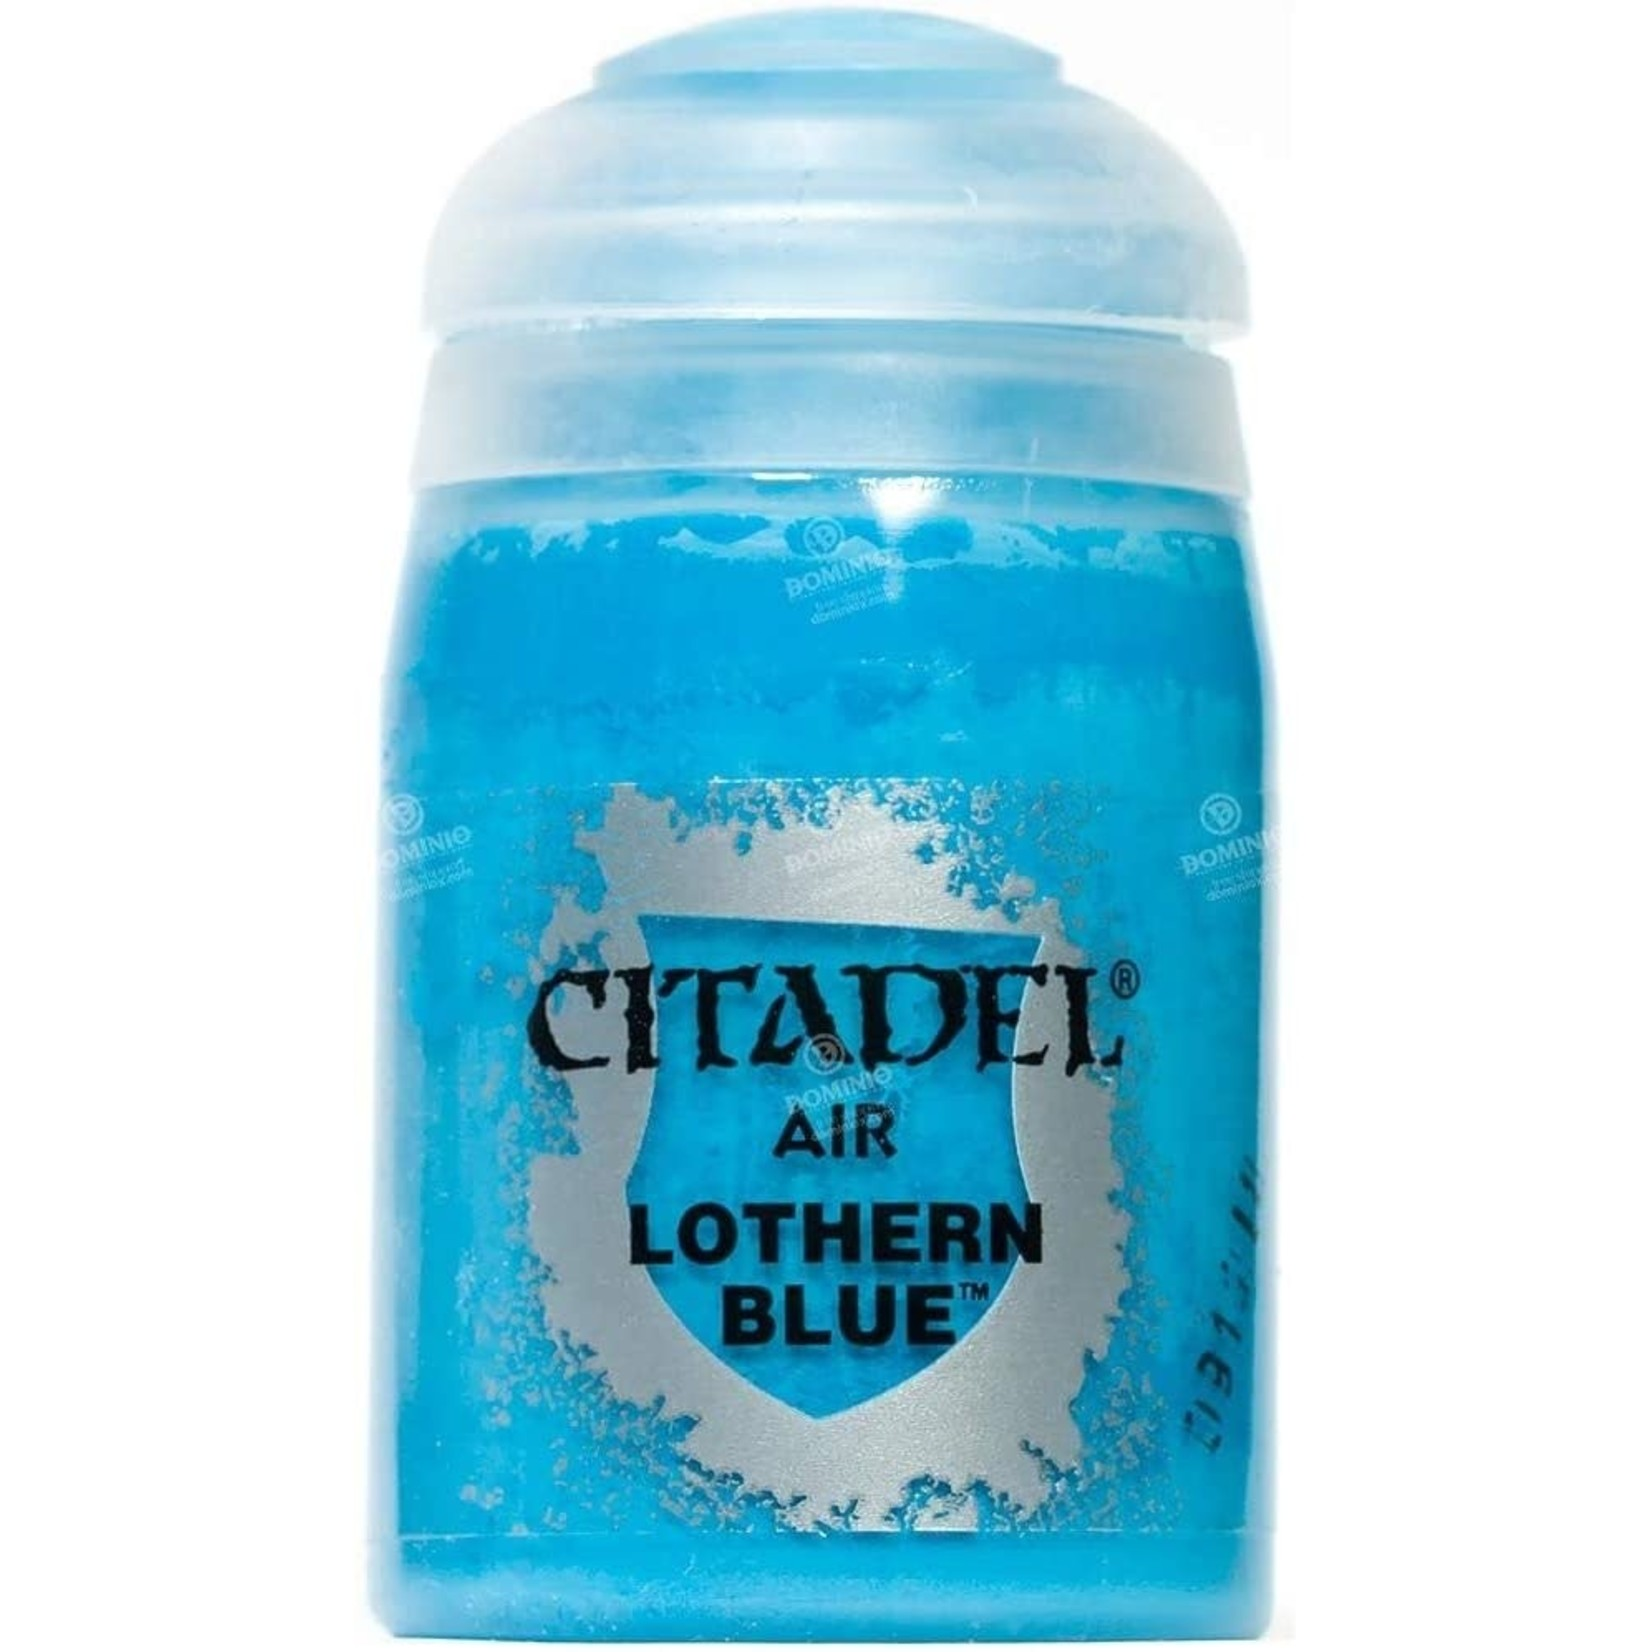 Games Workshop Citadel Paint: Lothern Blue Air (24 ml)